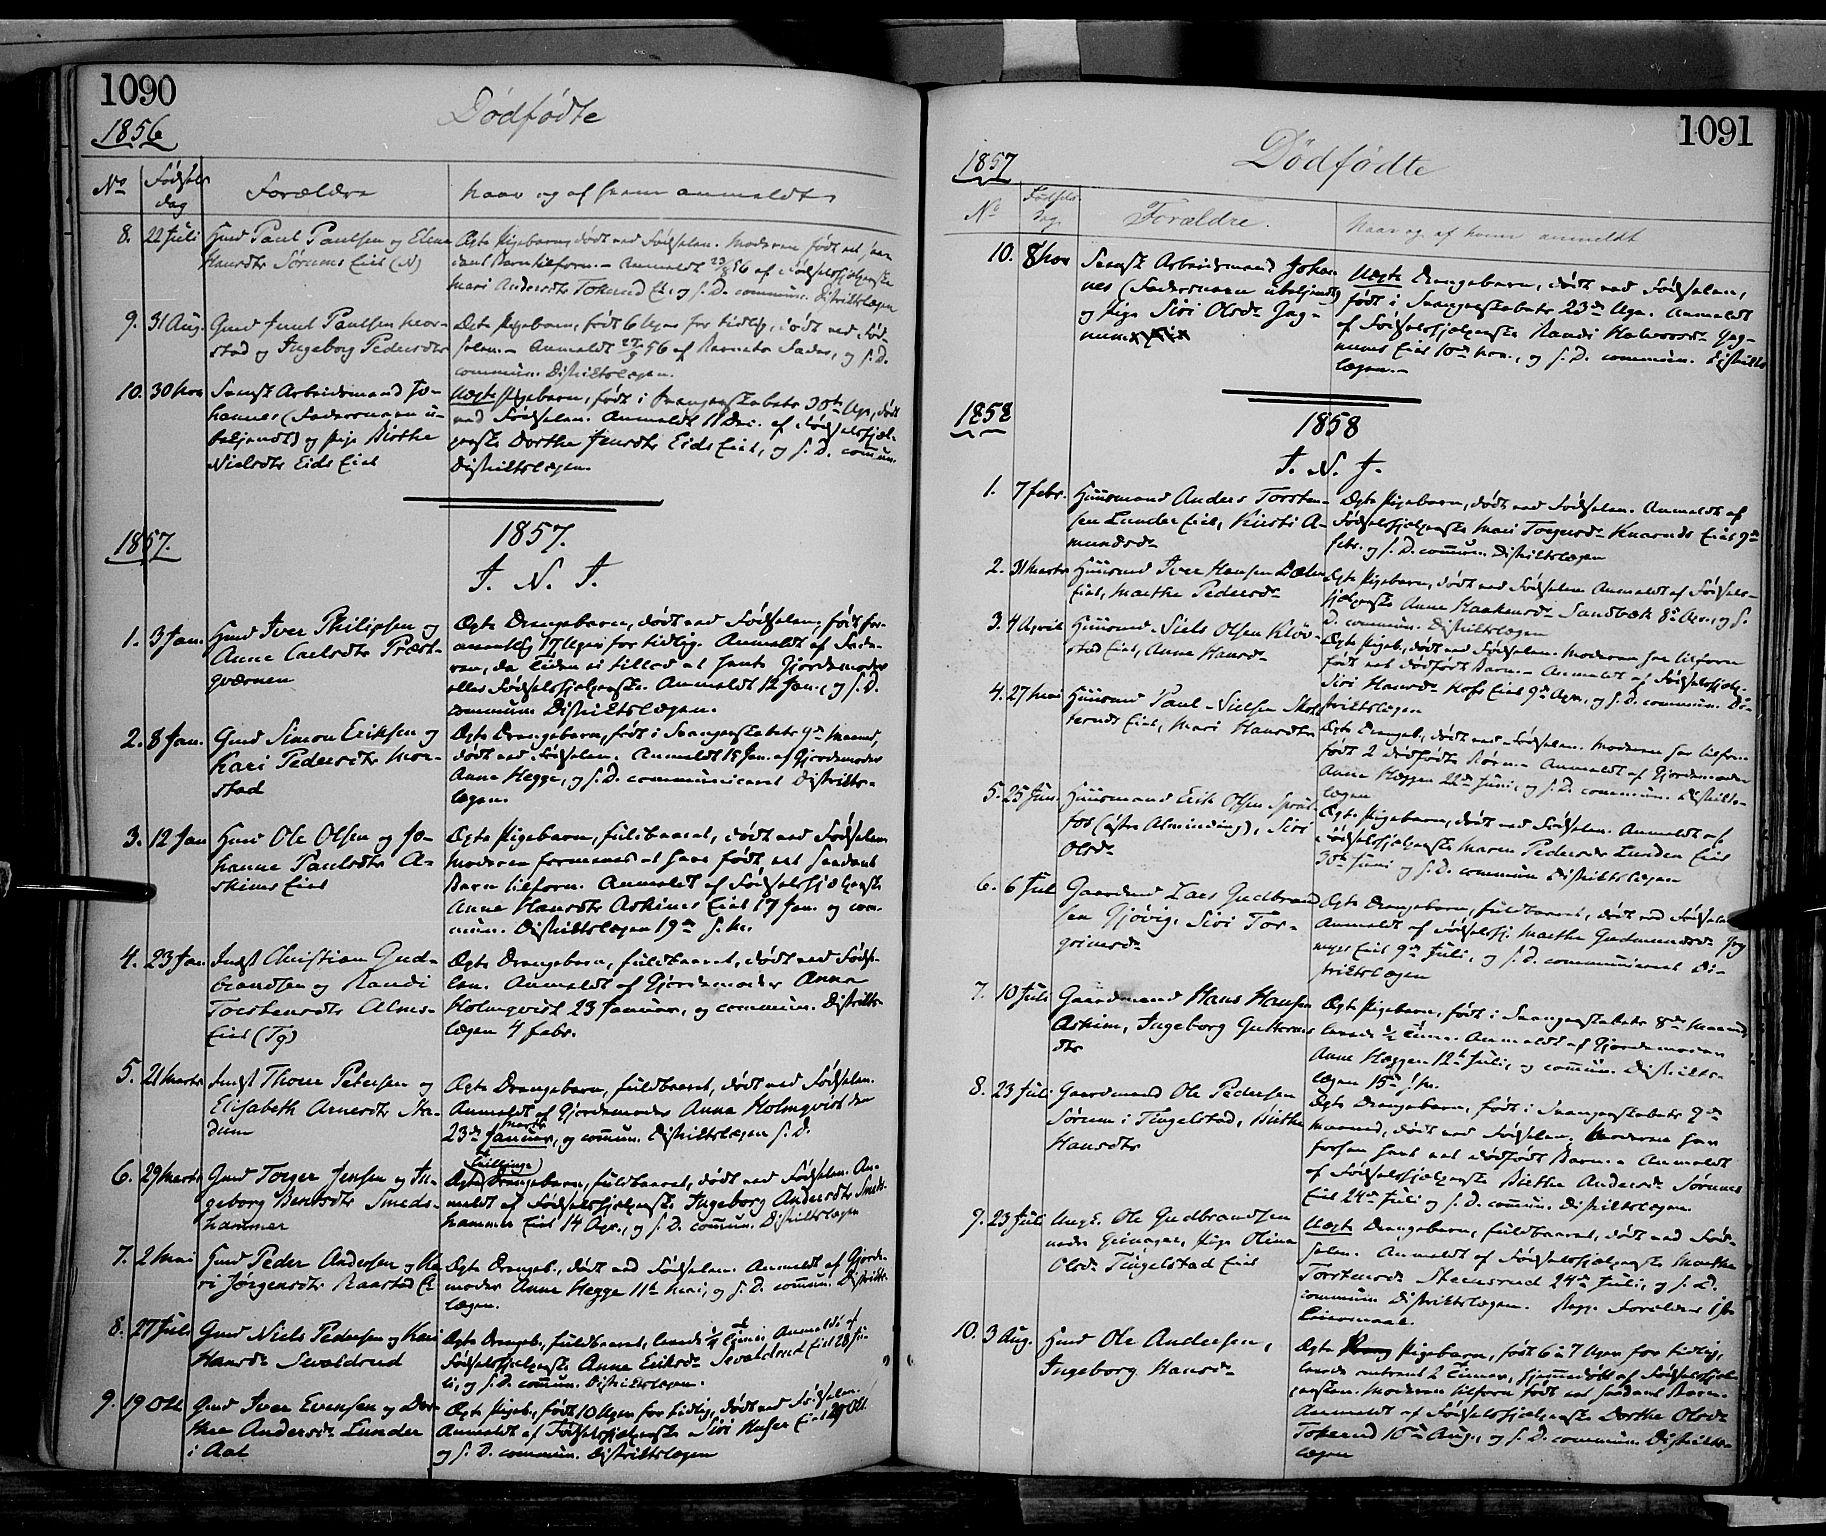 SAH, Gran prestekontor, Ministerialbok nr. 12, 1856-1874, s. 1090-1091